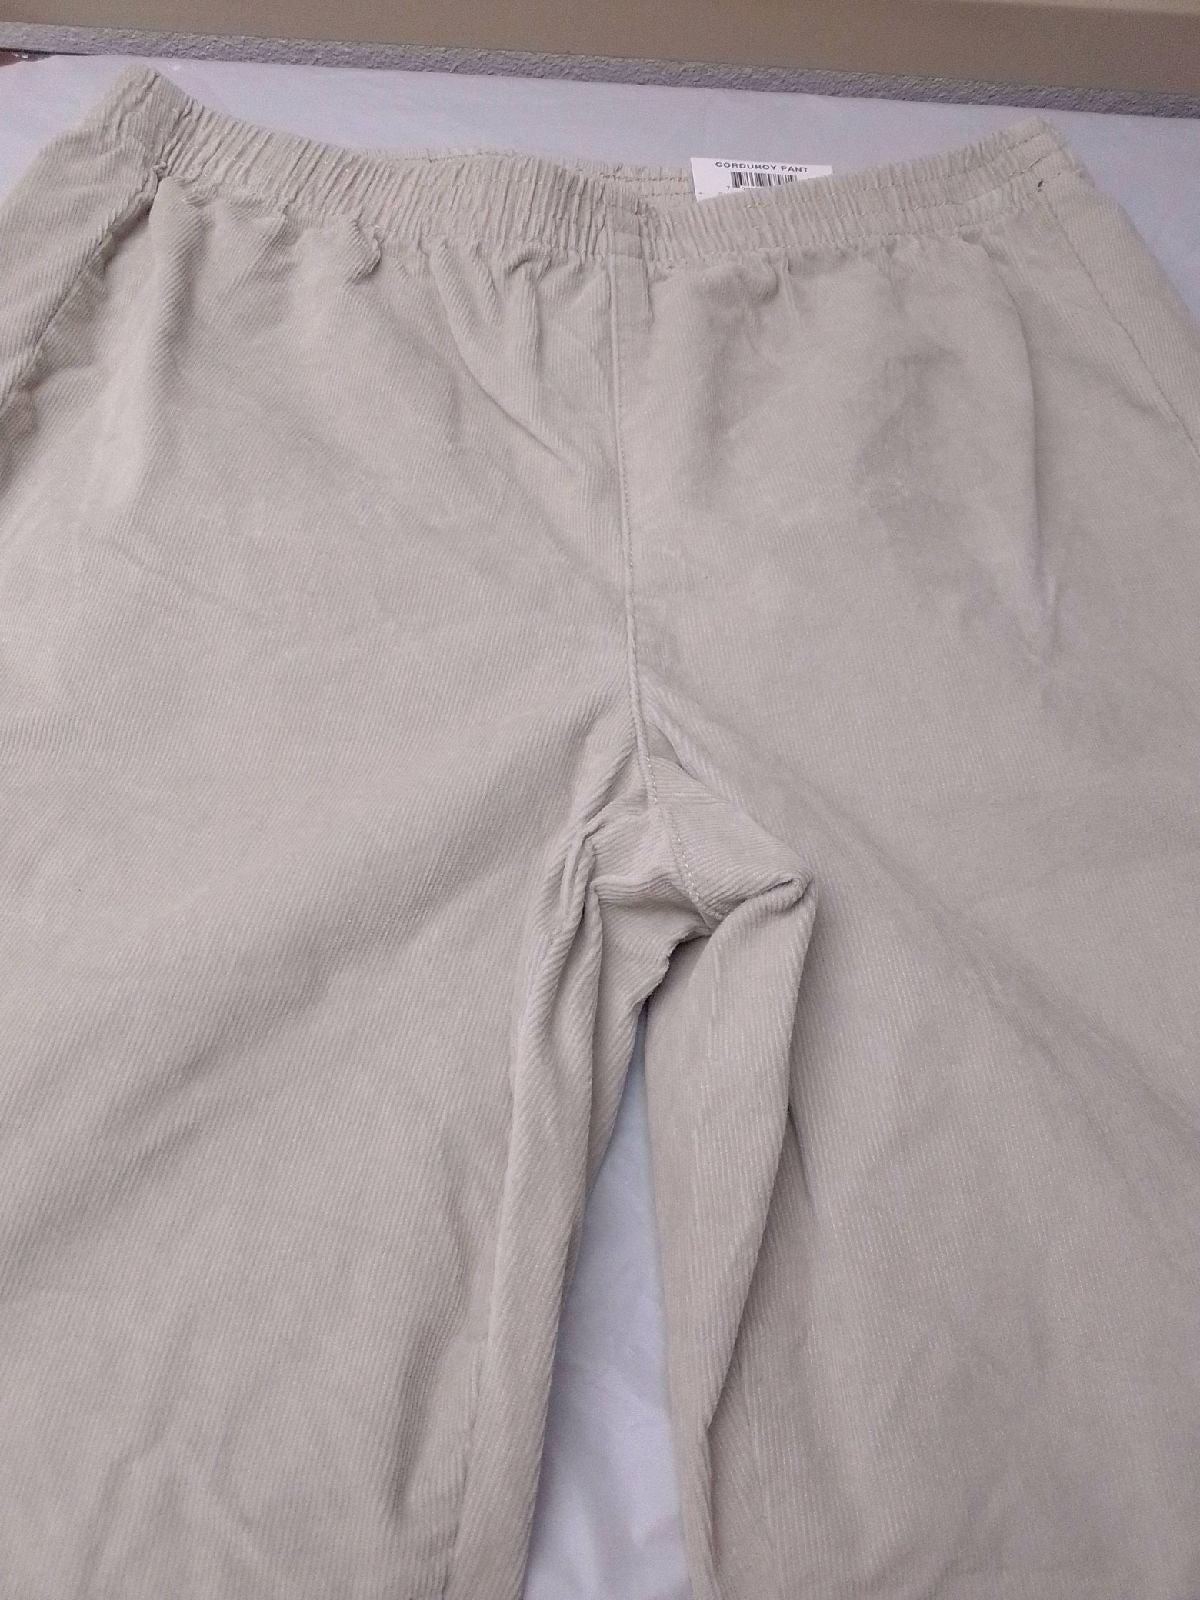 Size PS Women's Corduroy Petite Pants